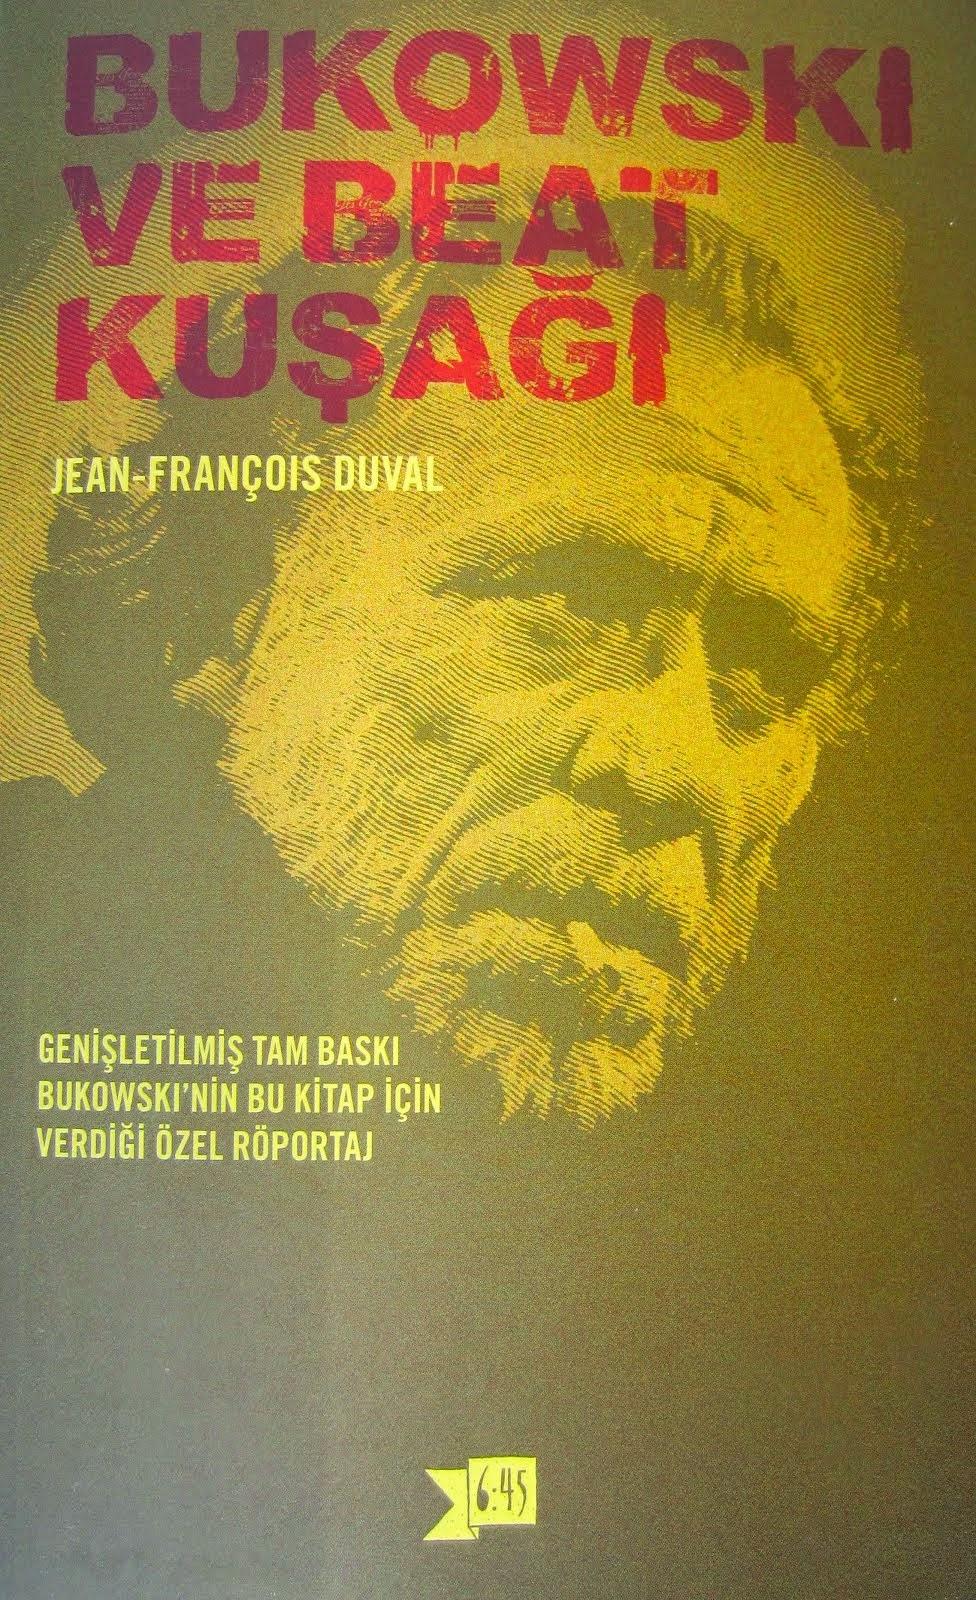 «Bukowski ve Beat Kusagi», éd. turque 2015.